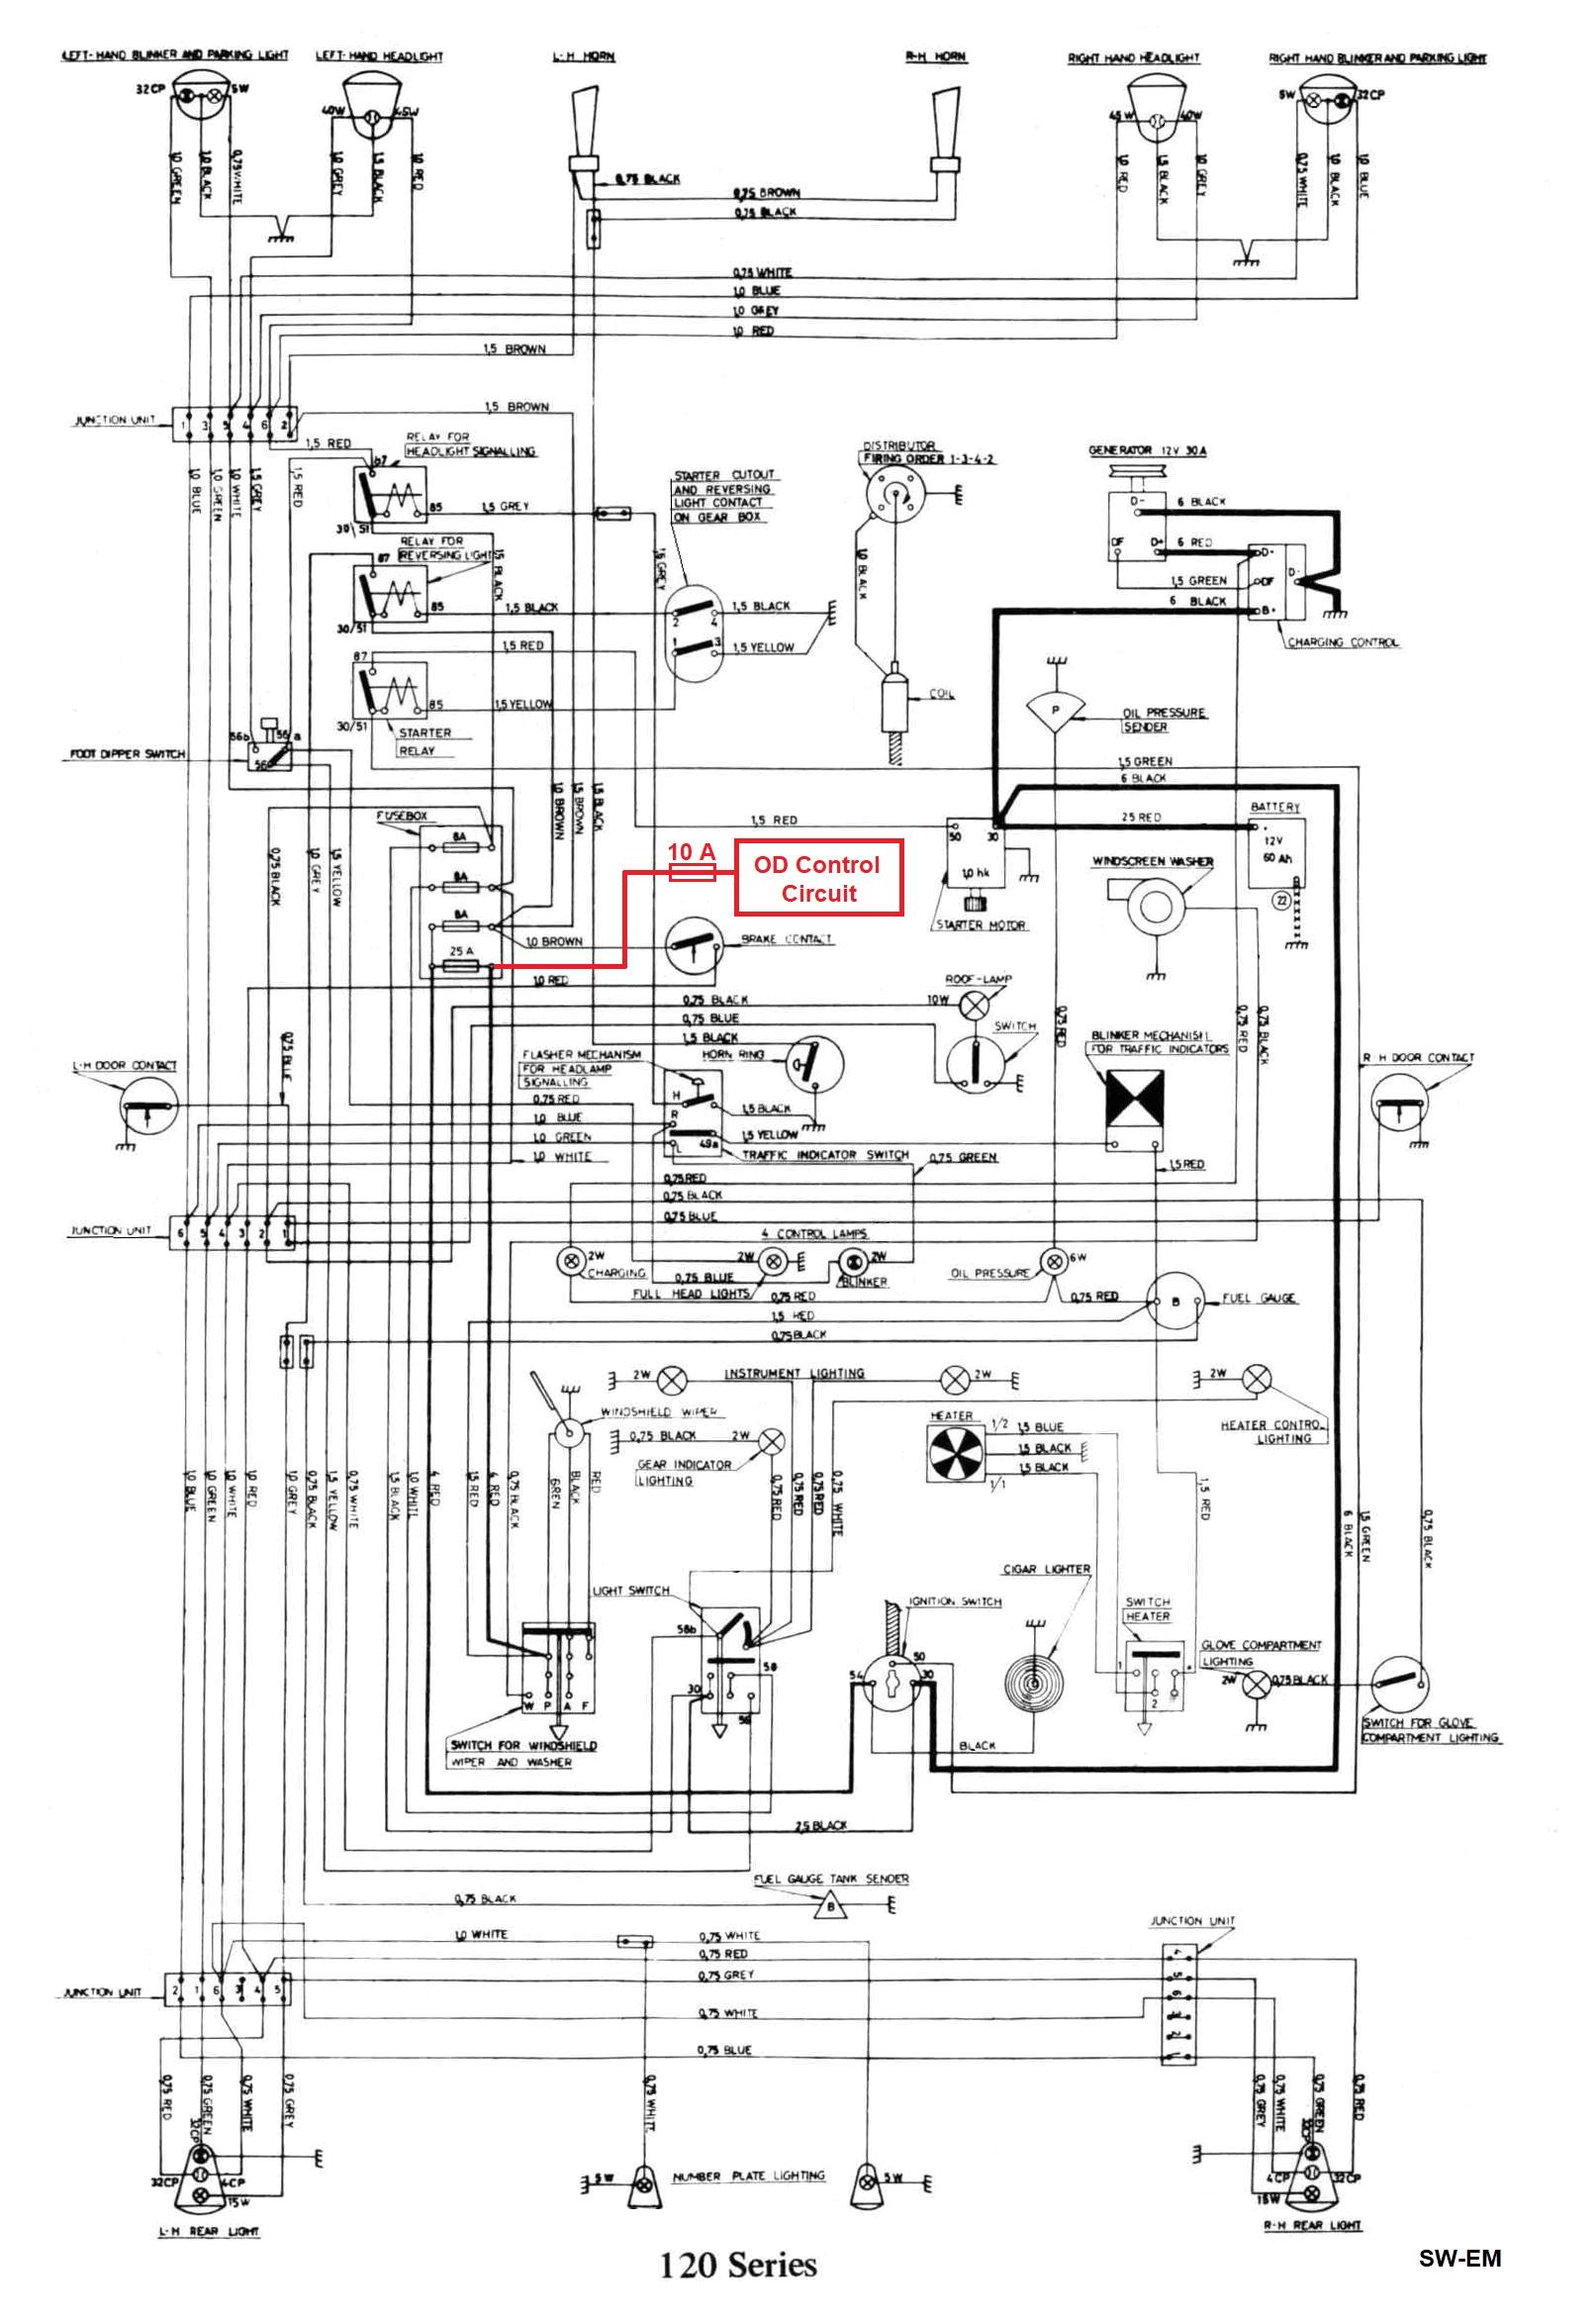 gen tran wiring diagram lovely sw em od retrofitting on a vintage volvo